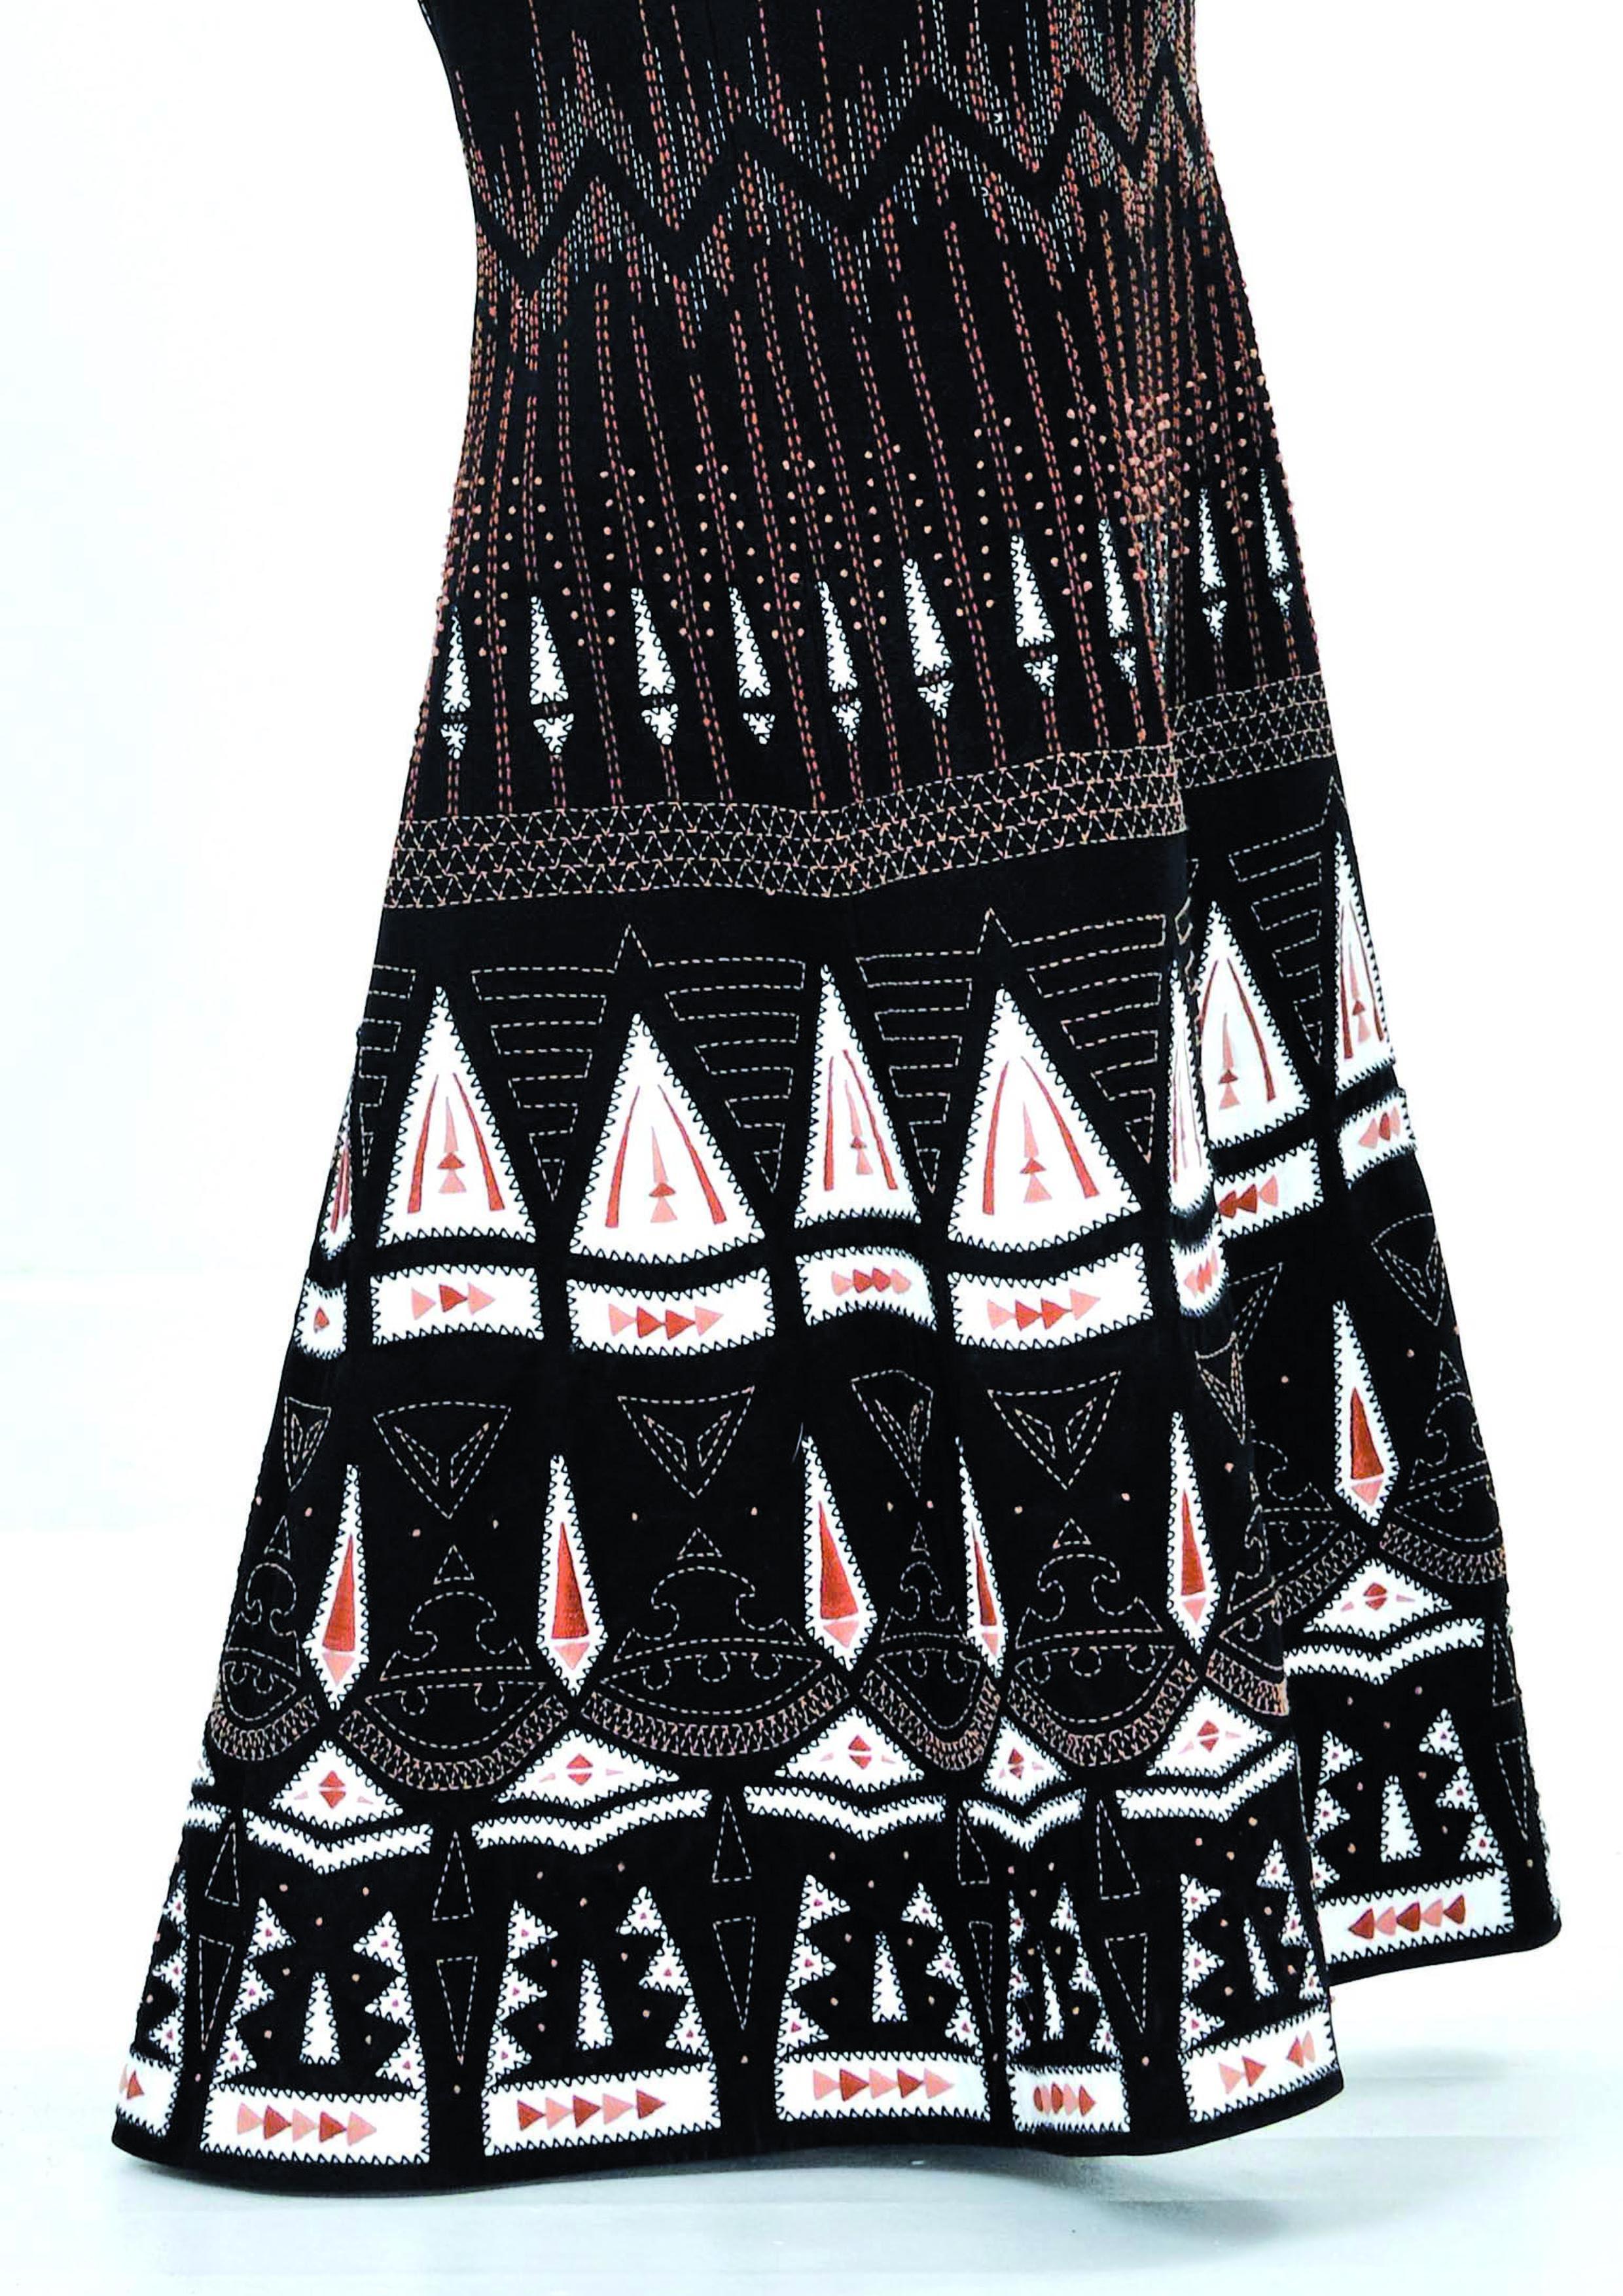 NAYANKA Dress details